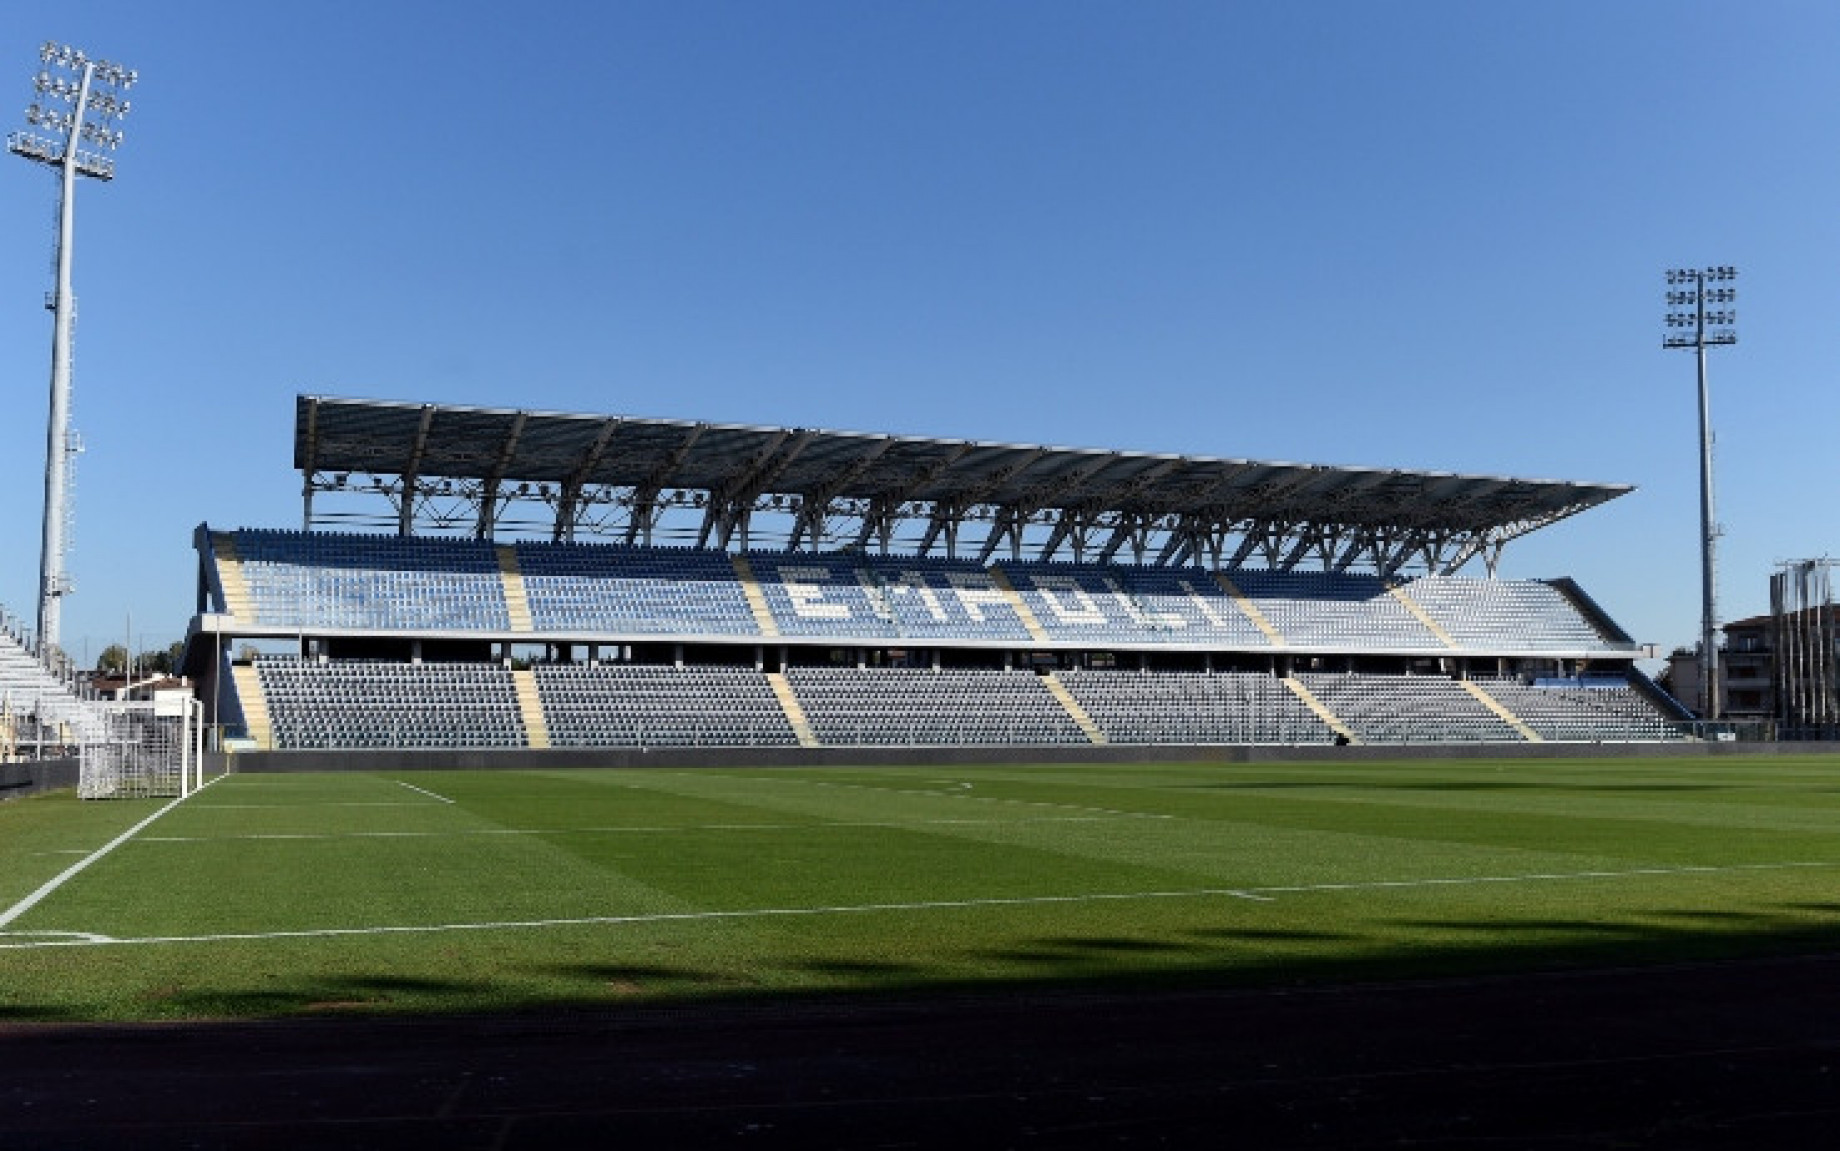 empoli_stadio_castellani_image.jpg